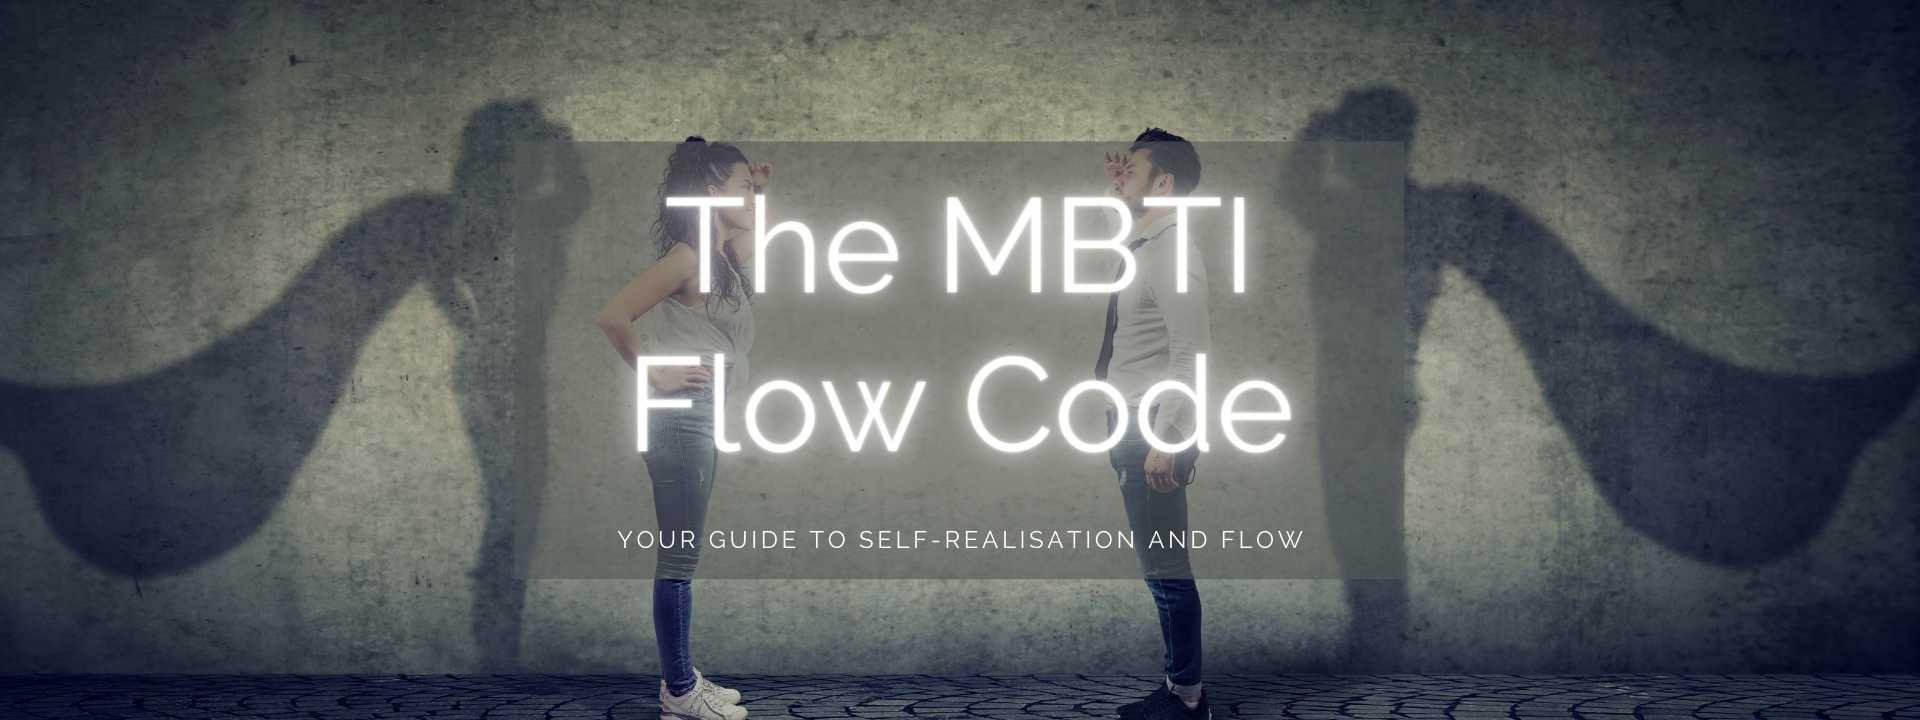 The MBTI Flow Code